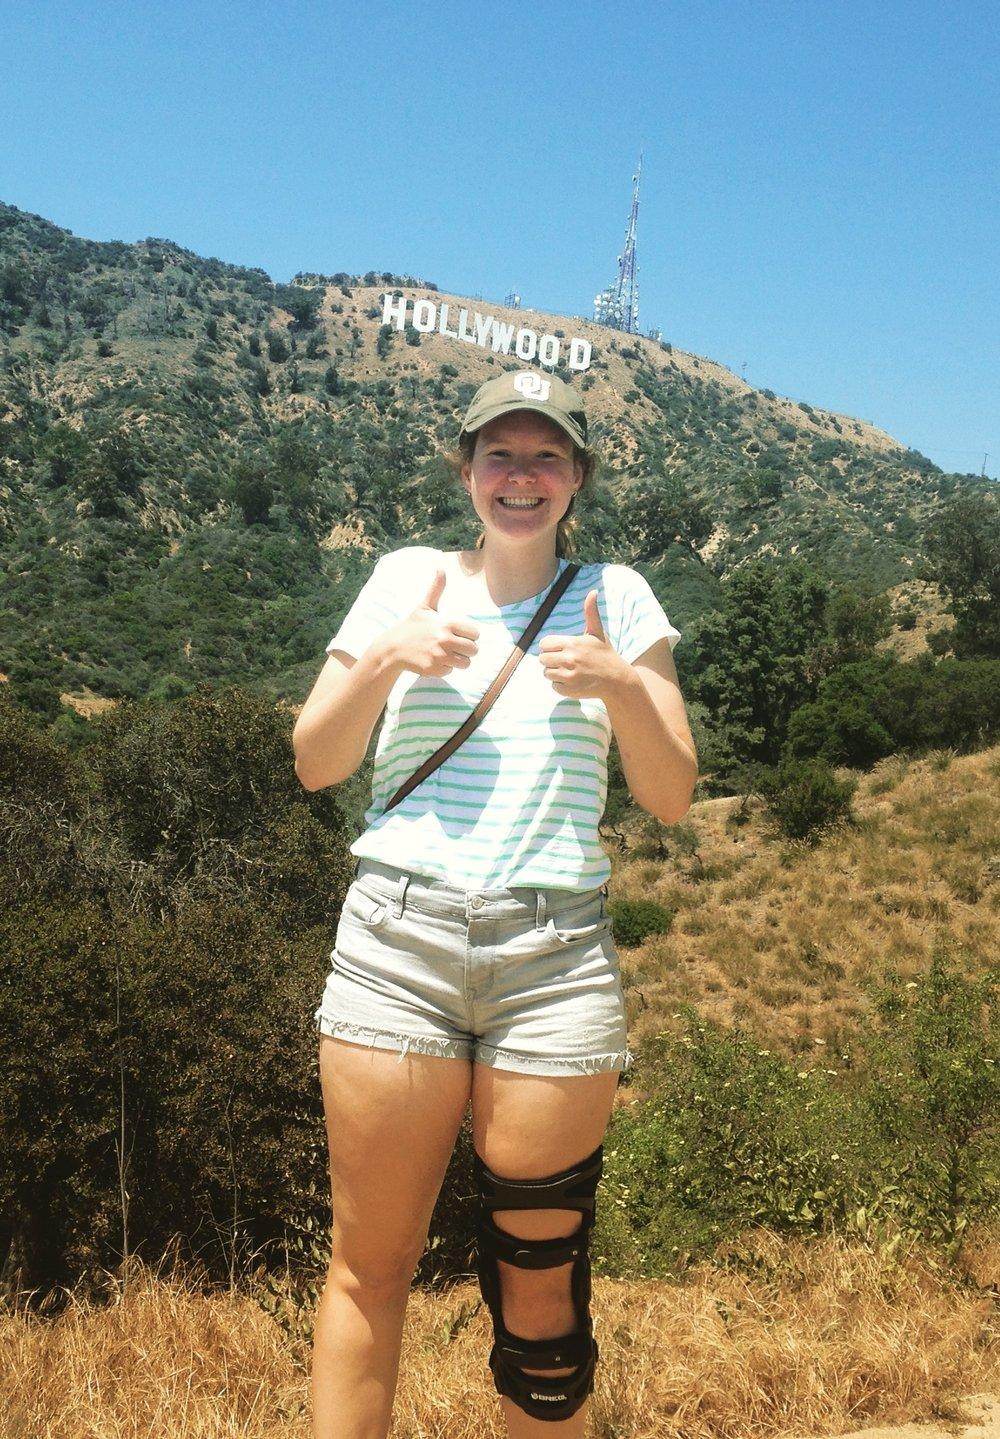 Savannah Heller, Senior HTC/BFA student, enjoying the life in sunny Los Angeles.